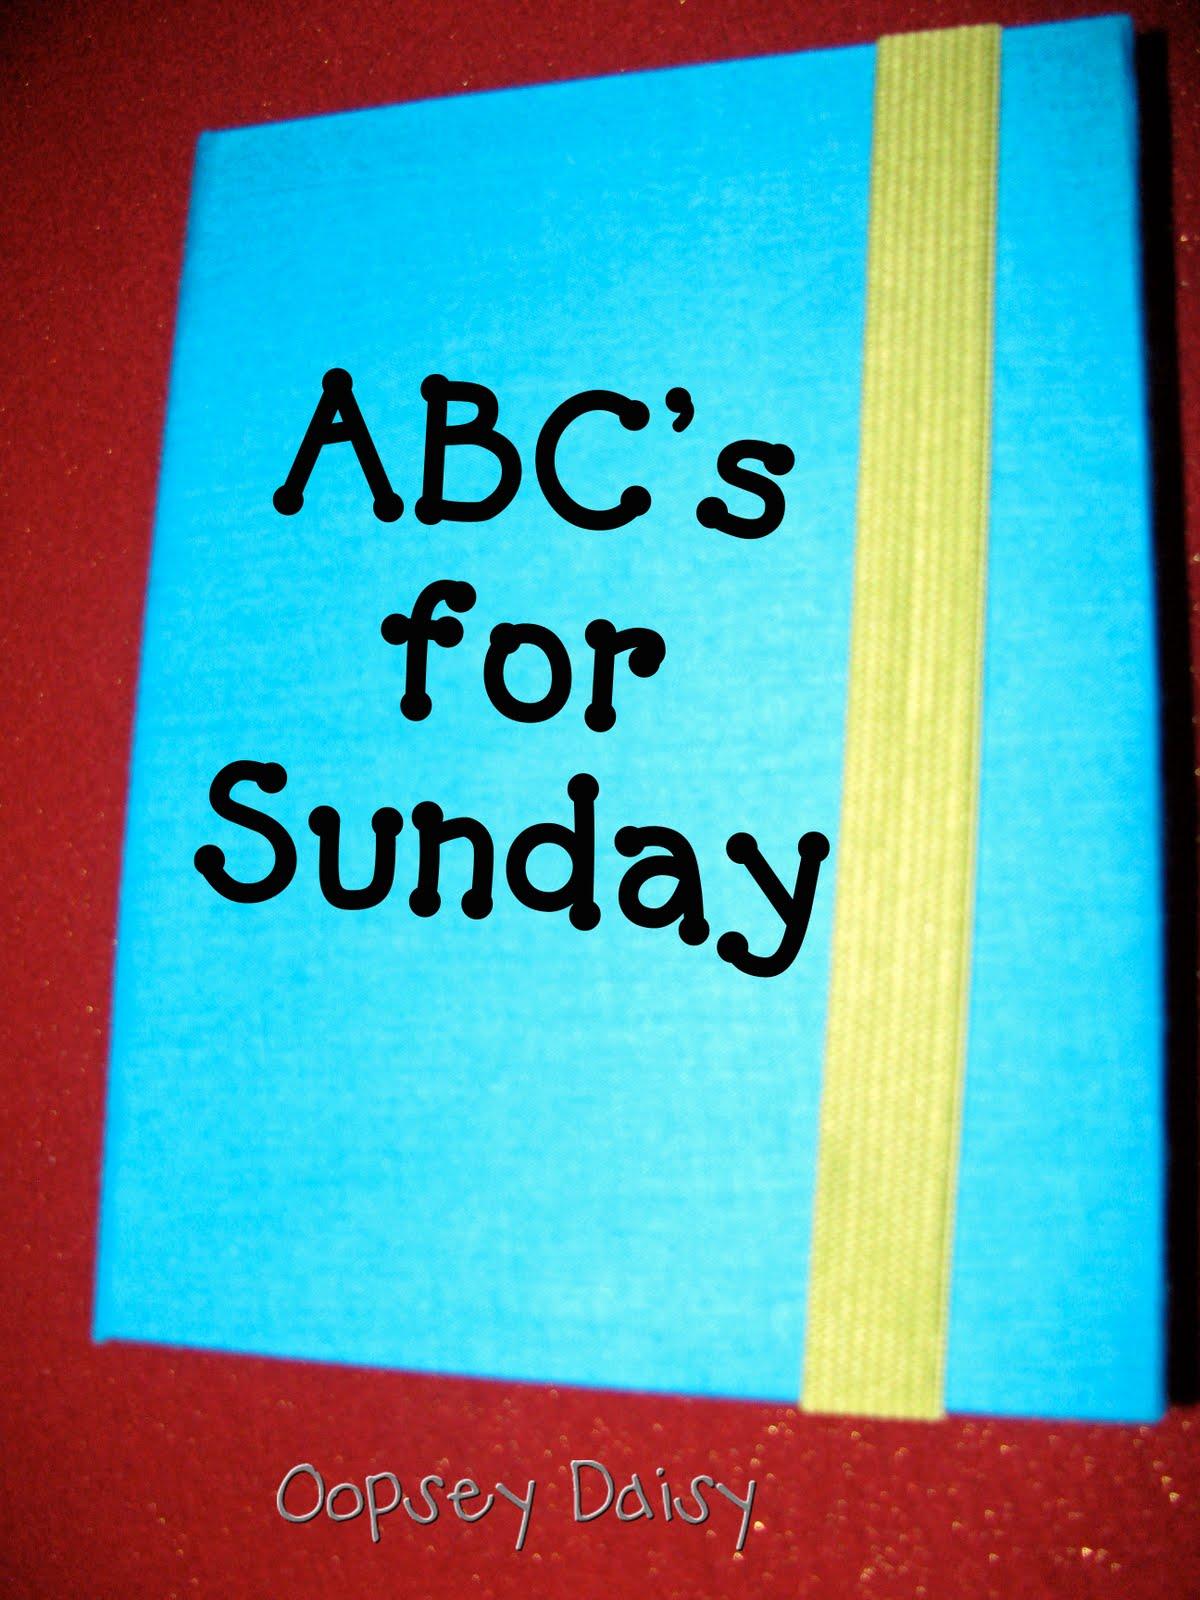 Abc scrapbook ideas list - Sunday Abc Book